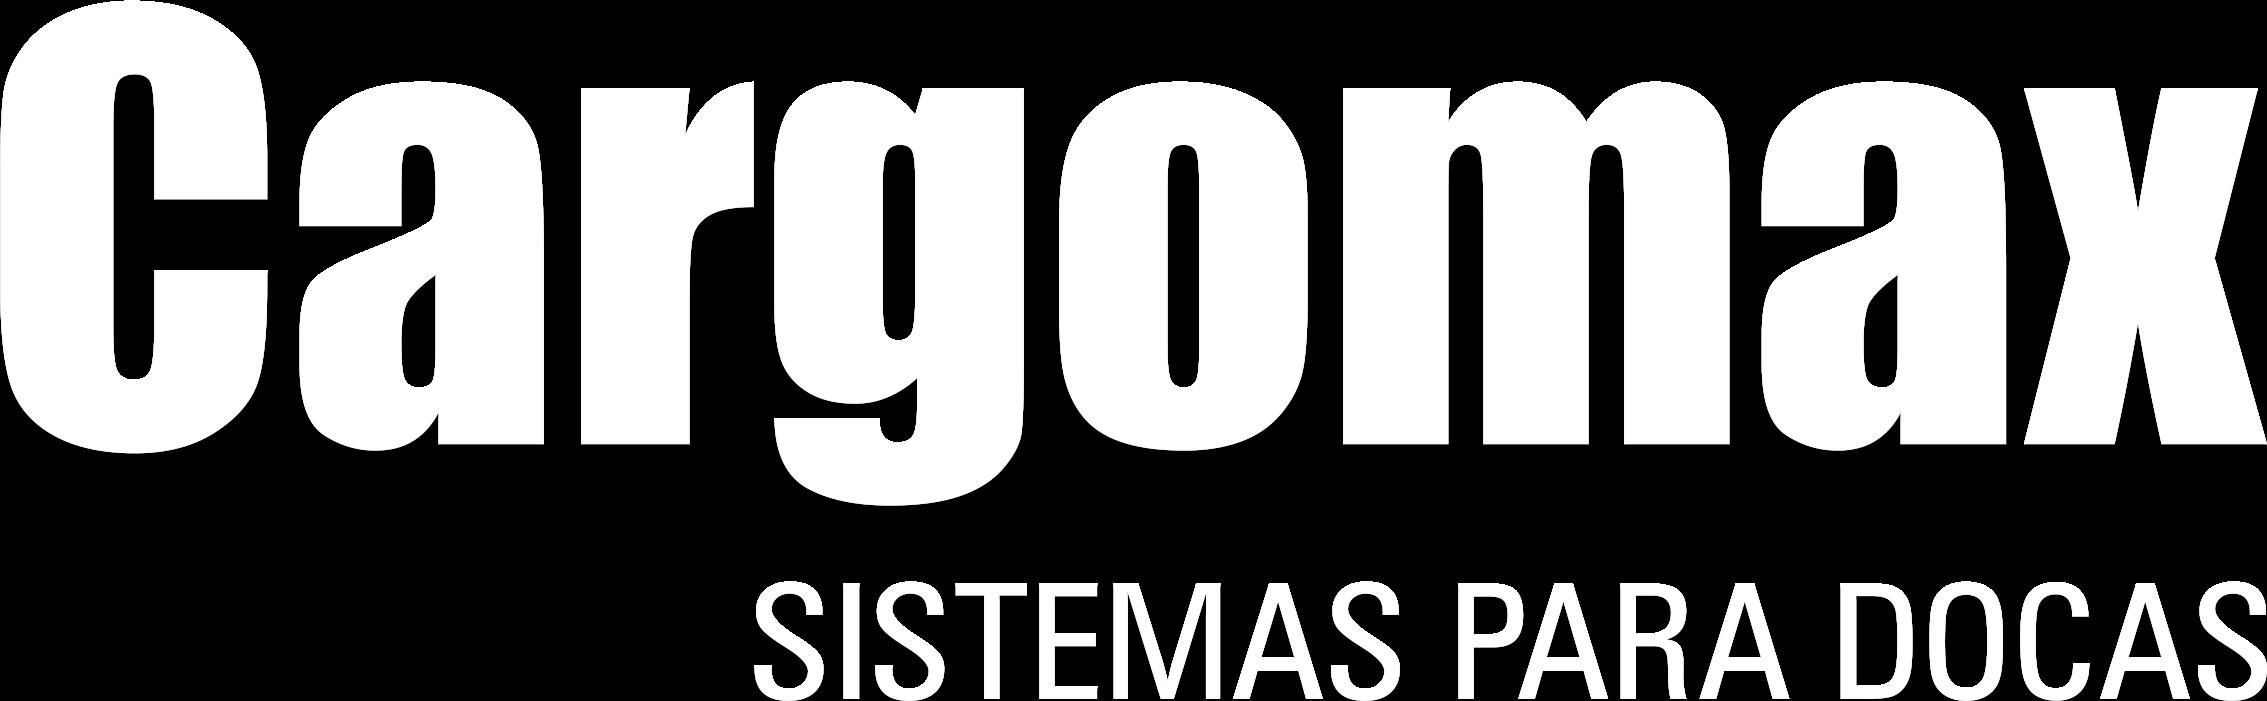 CARGOMAX SISTEMAS PARA DOCAS LOGO